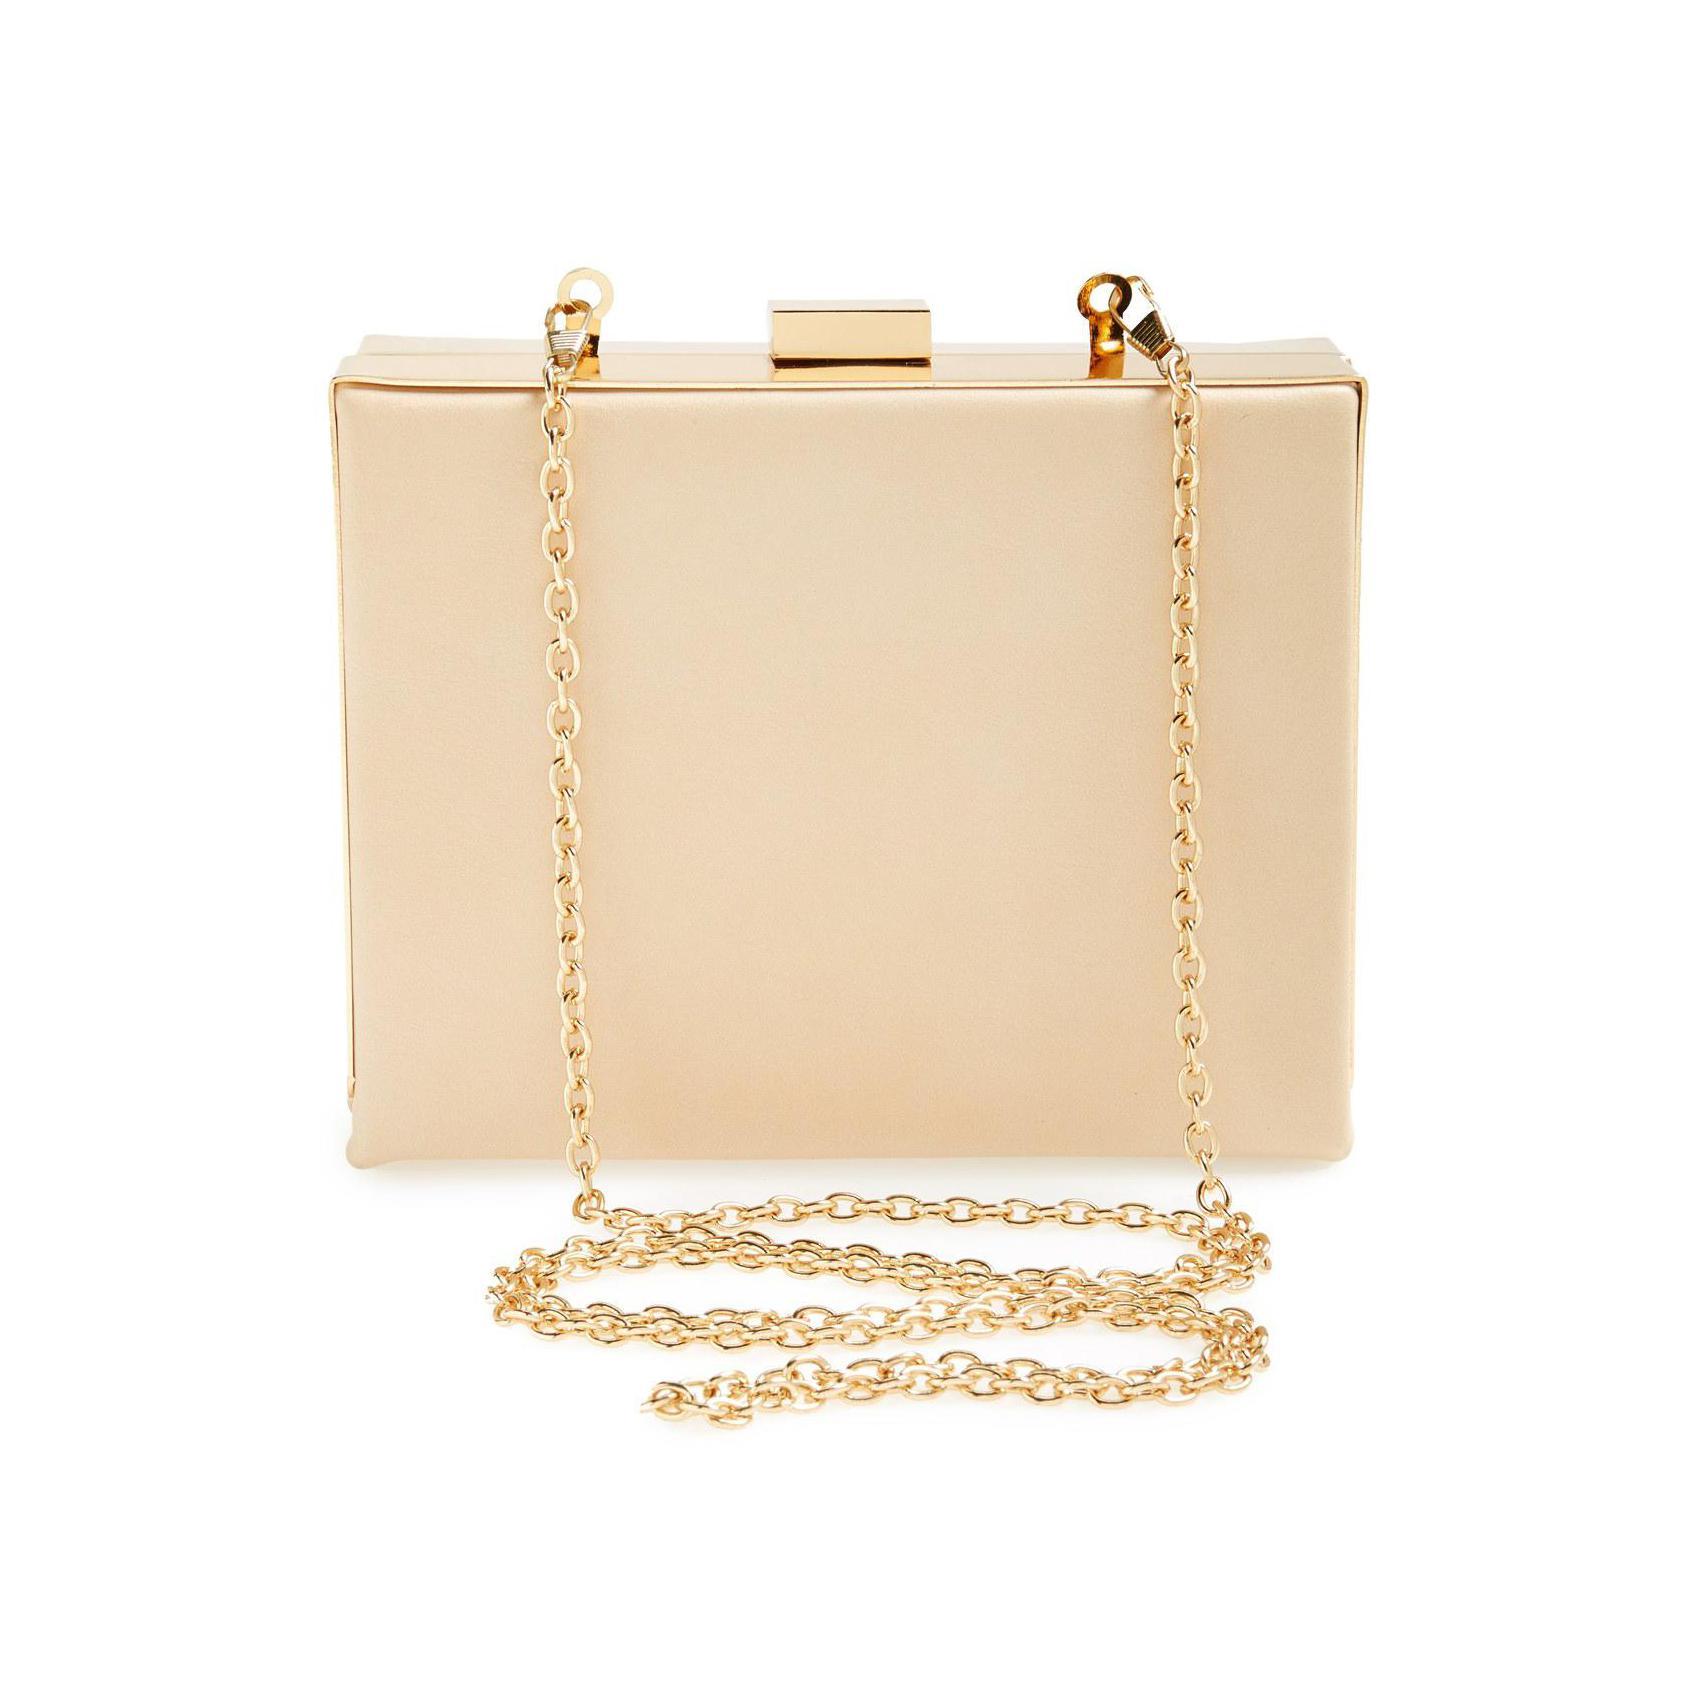 20-Natasha-Couture-Box-Clutch-4.jpg